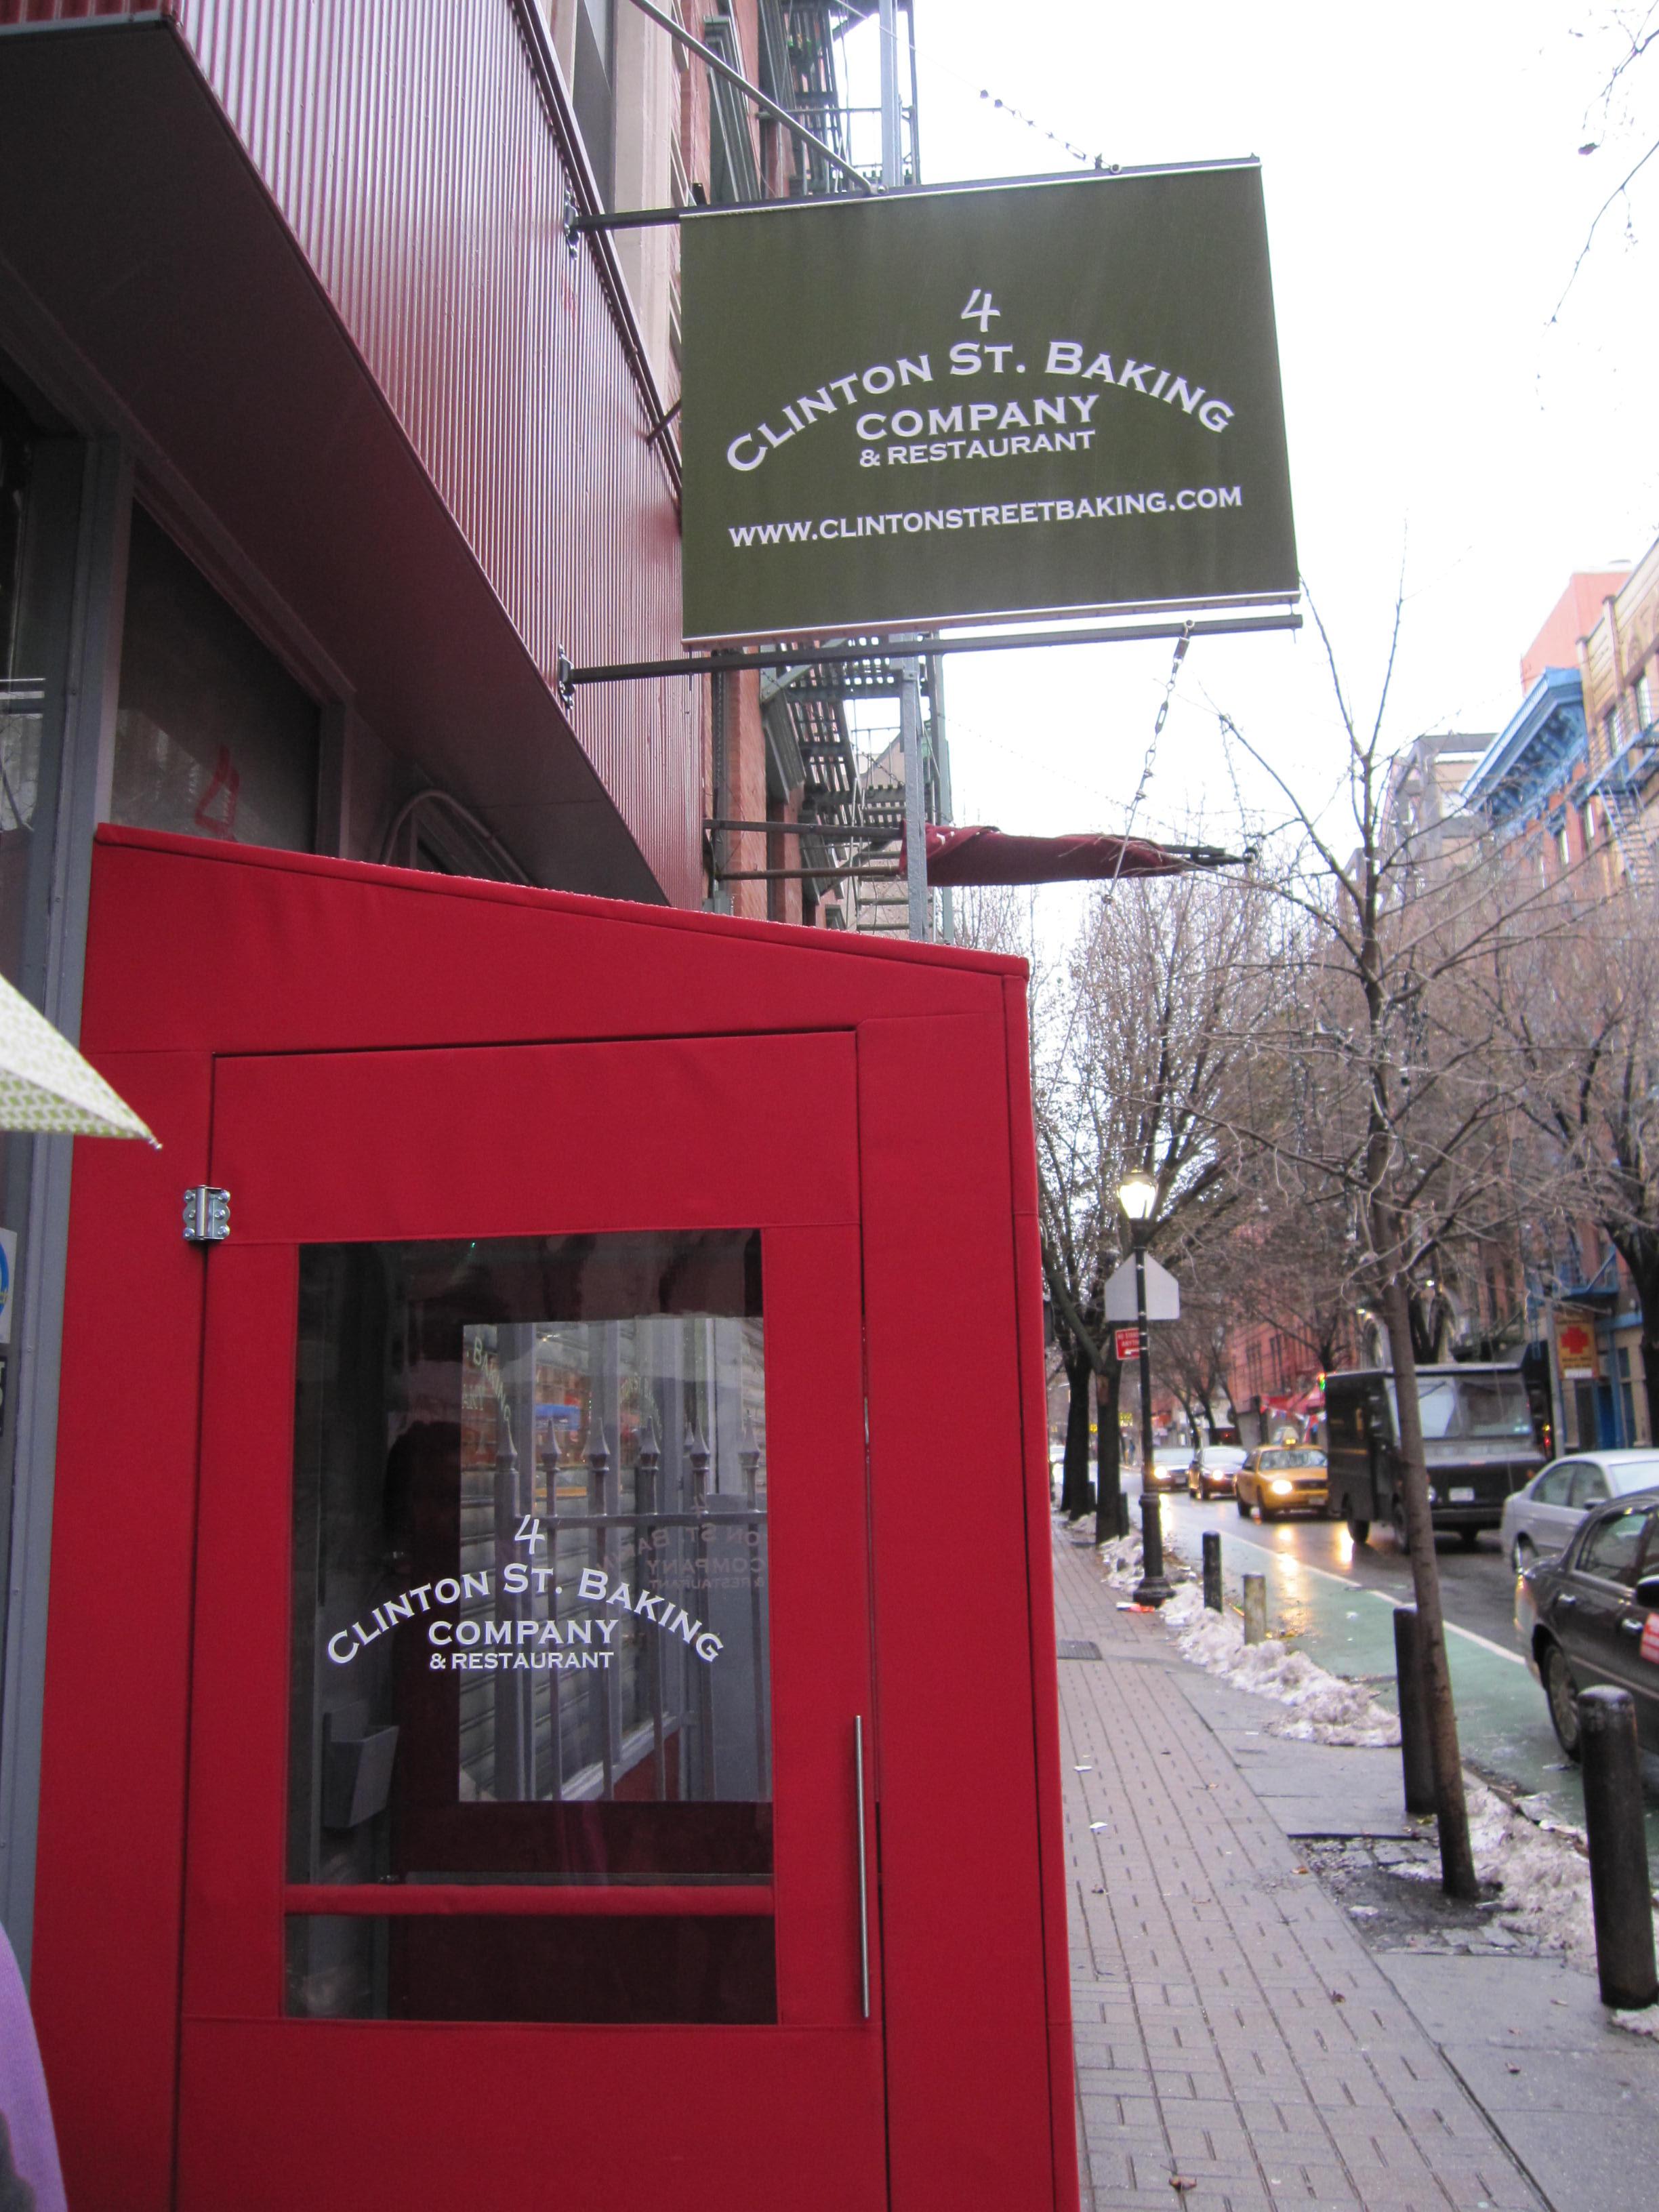 Clinton Street Baking Co. & Restaurant